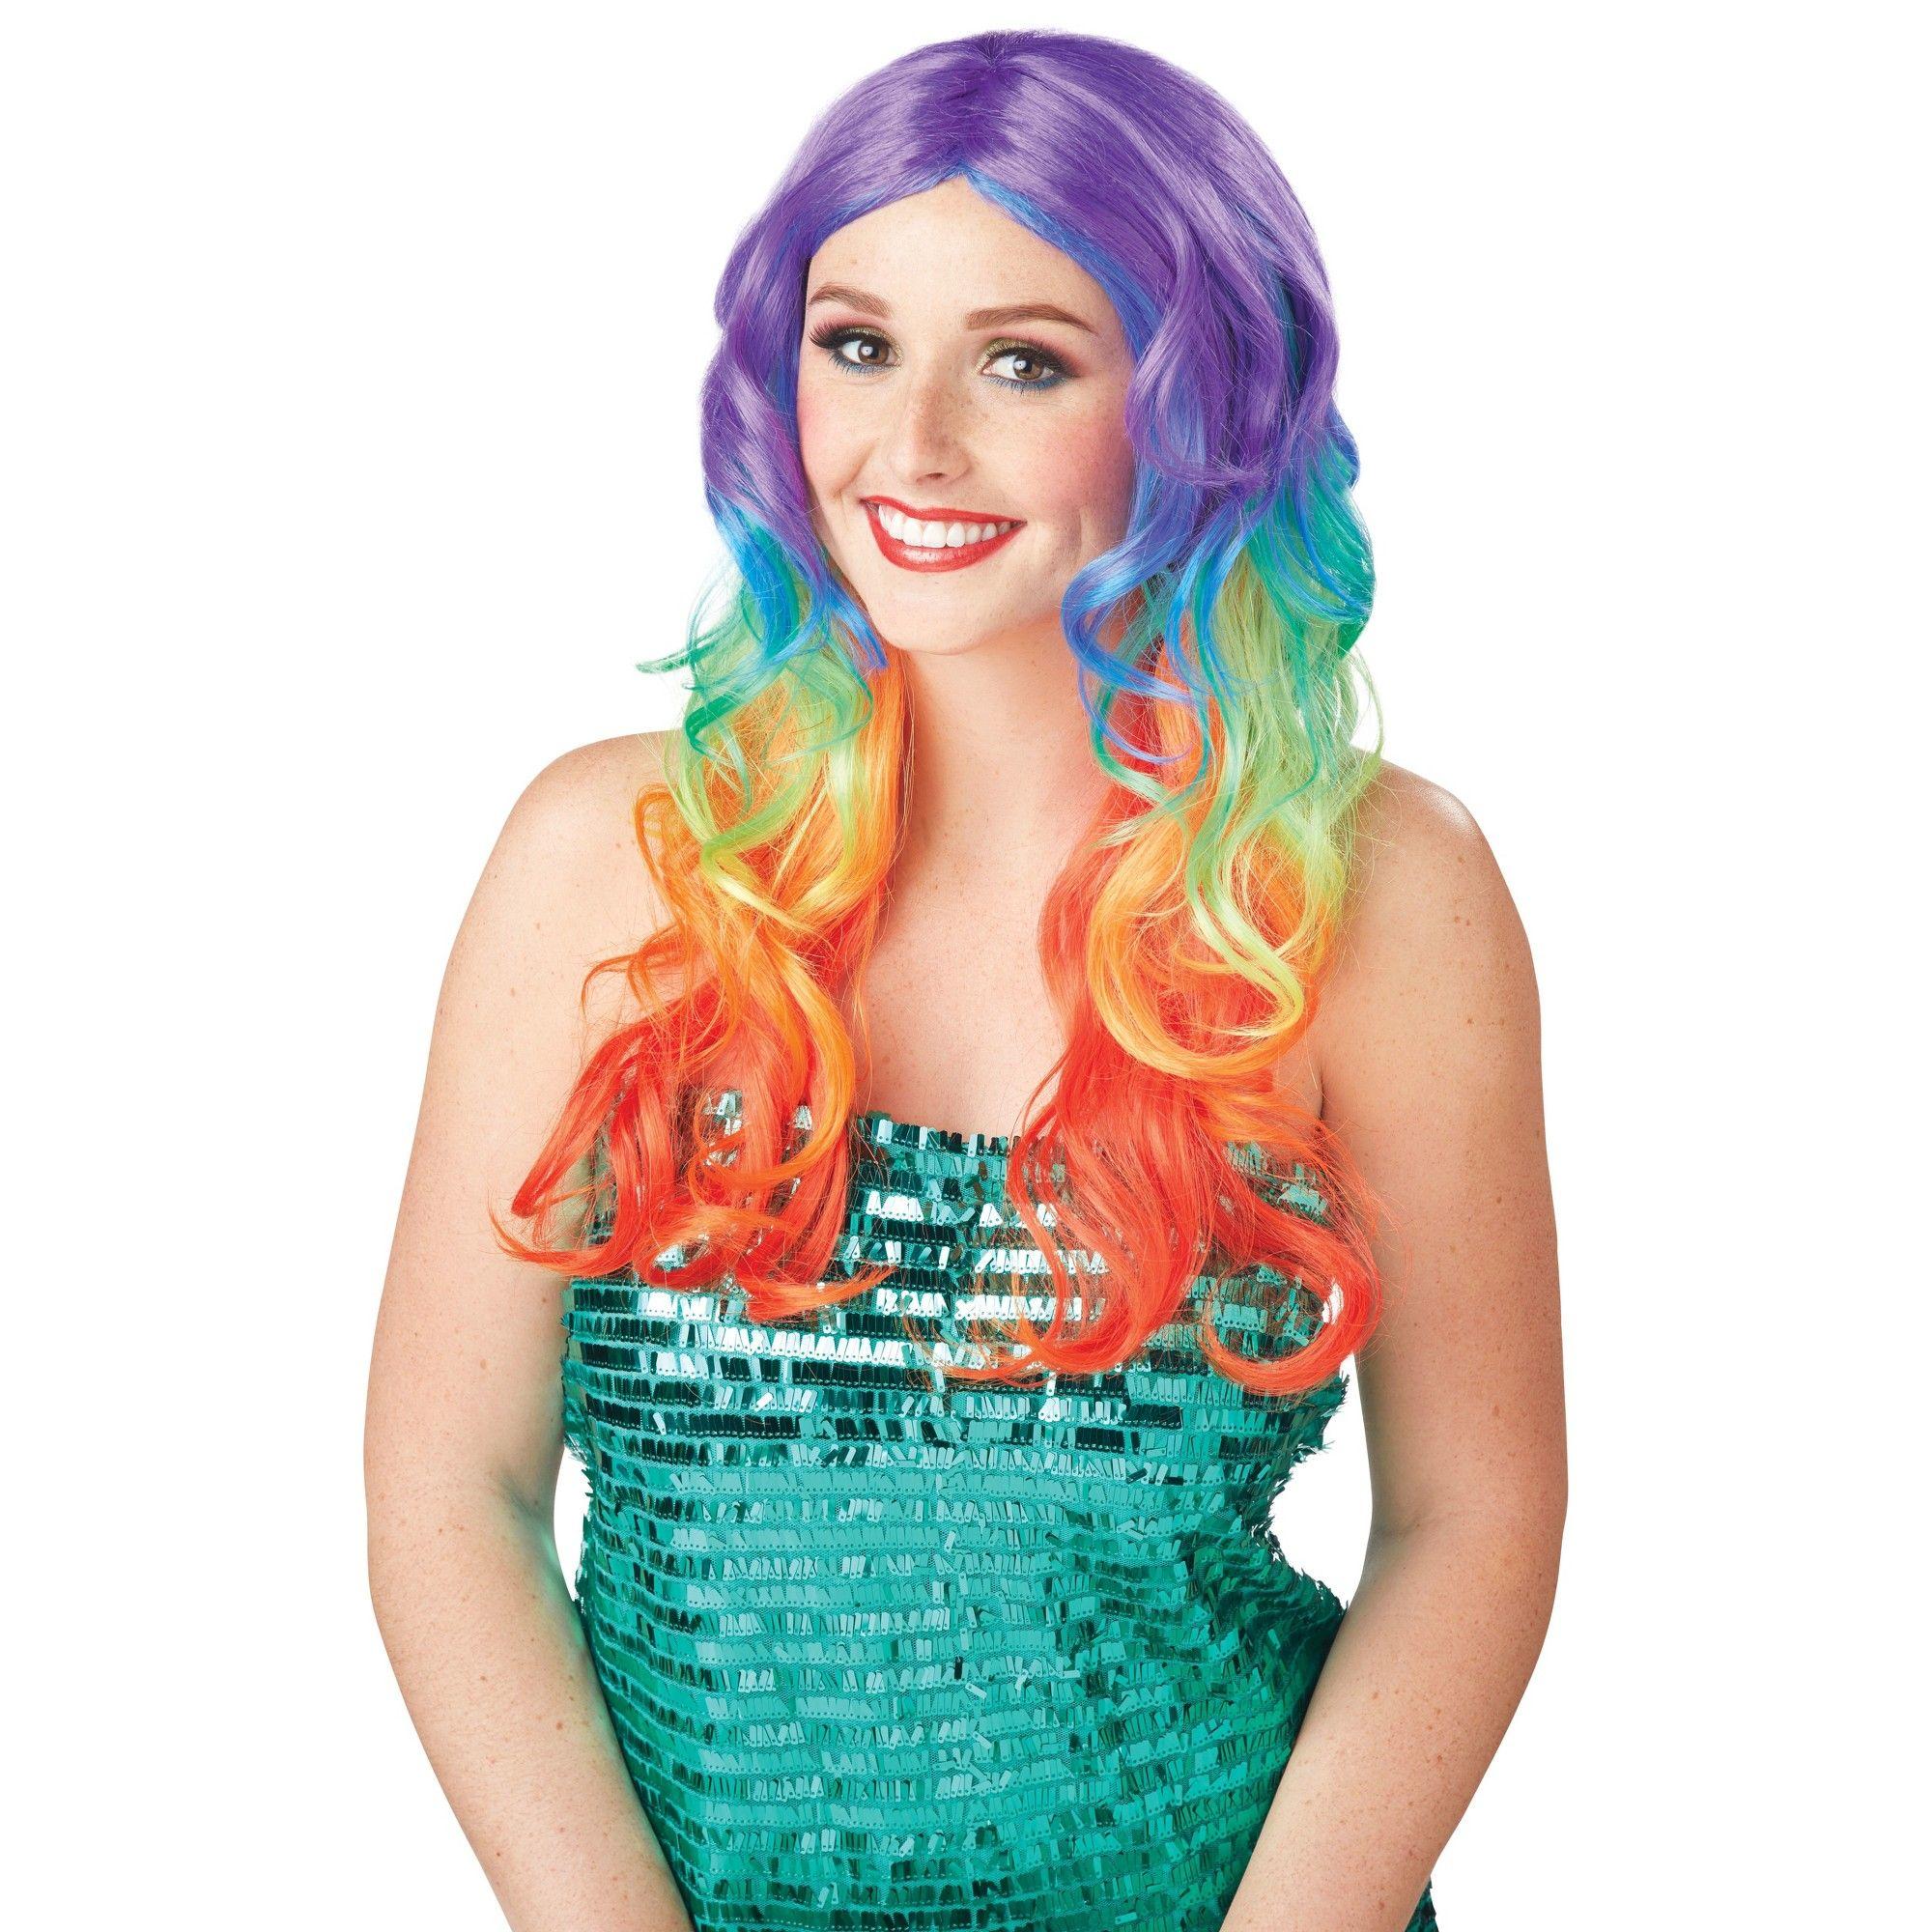 Kaleidoscope Rainbow Layered Punk Rock Women Costume Wig